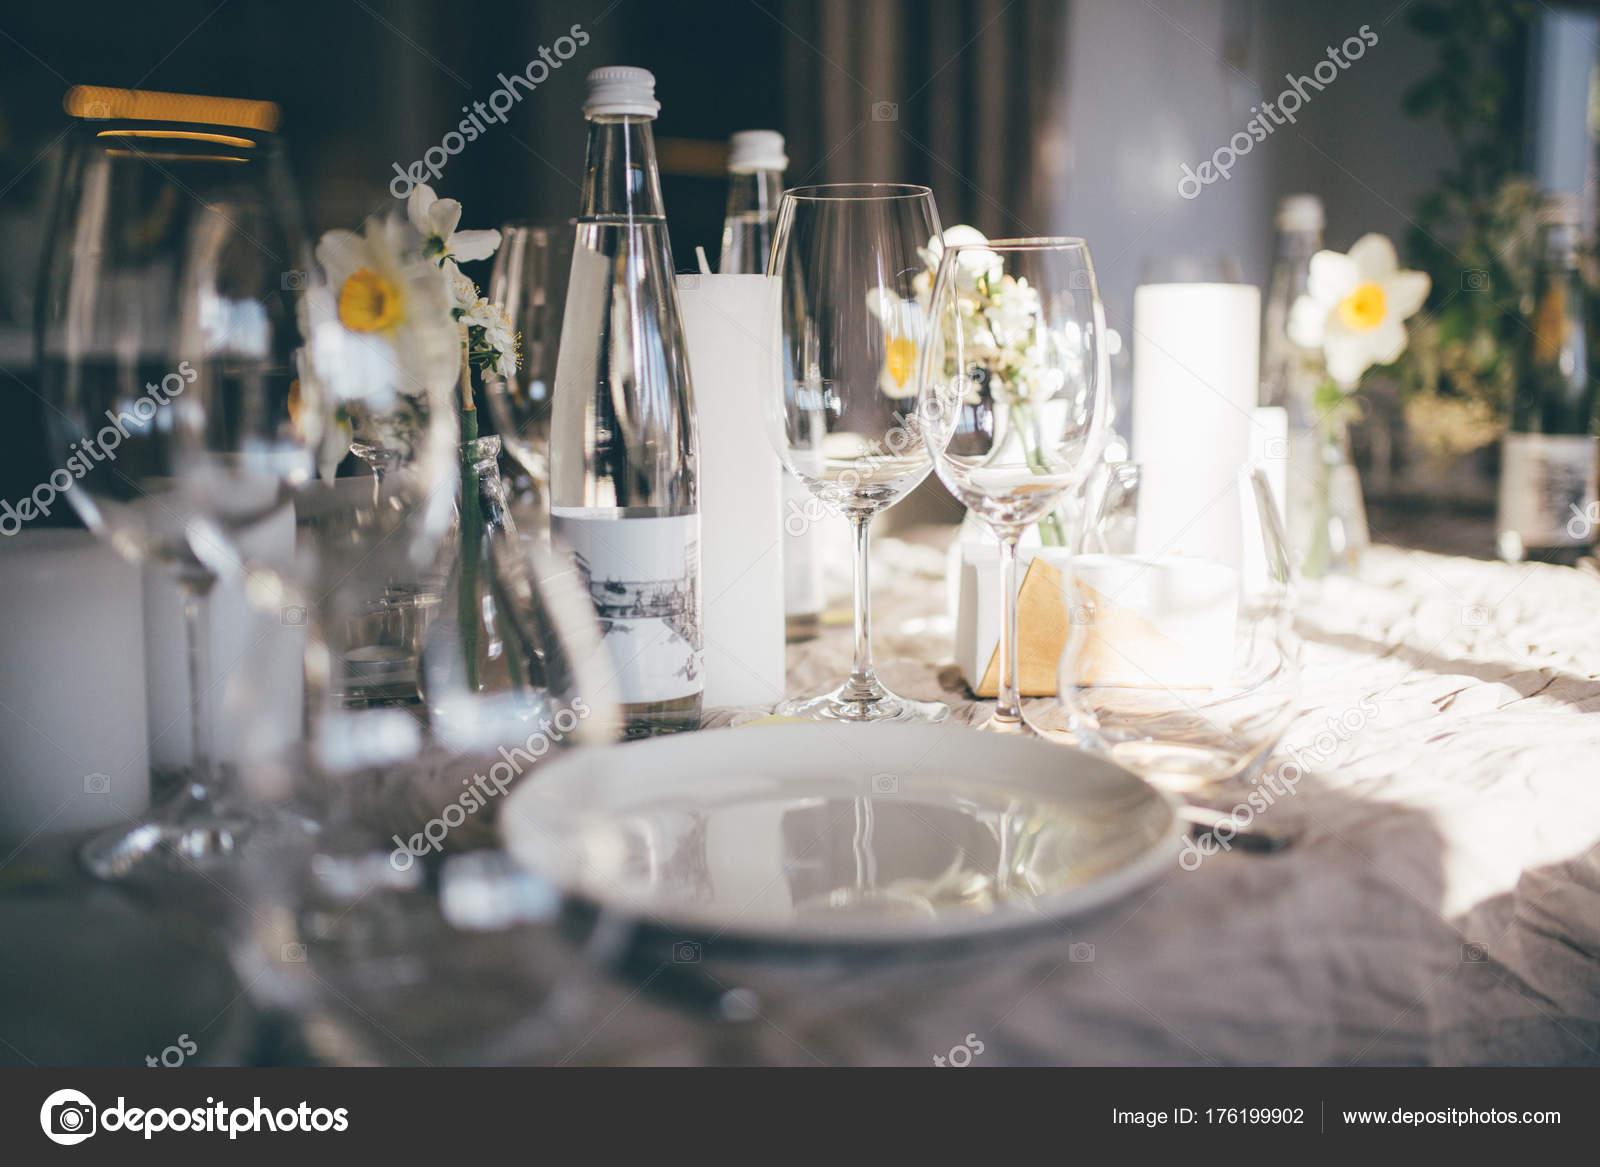 Table Setting Dinner Restaurant Sunset Served Wedding Table Decor - Restaurant table candles